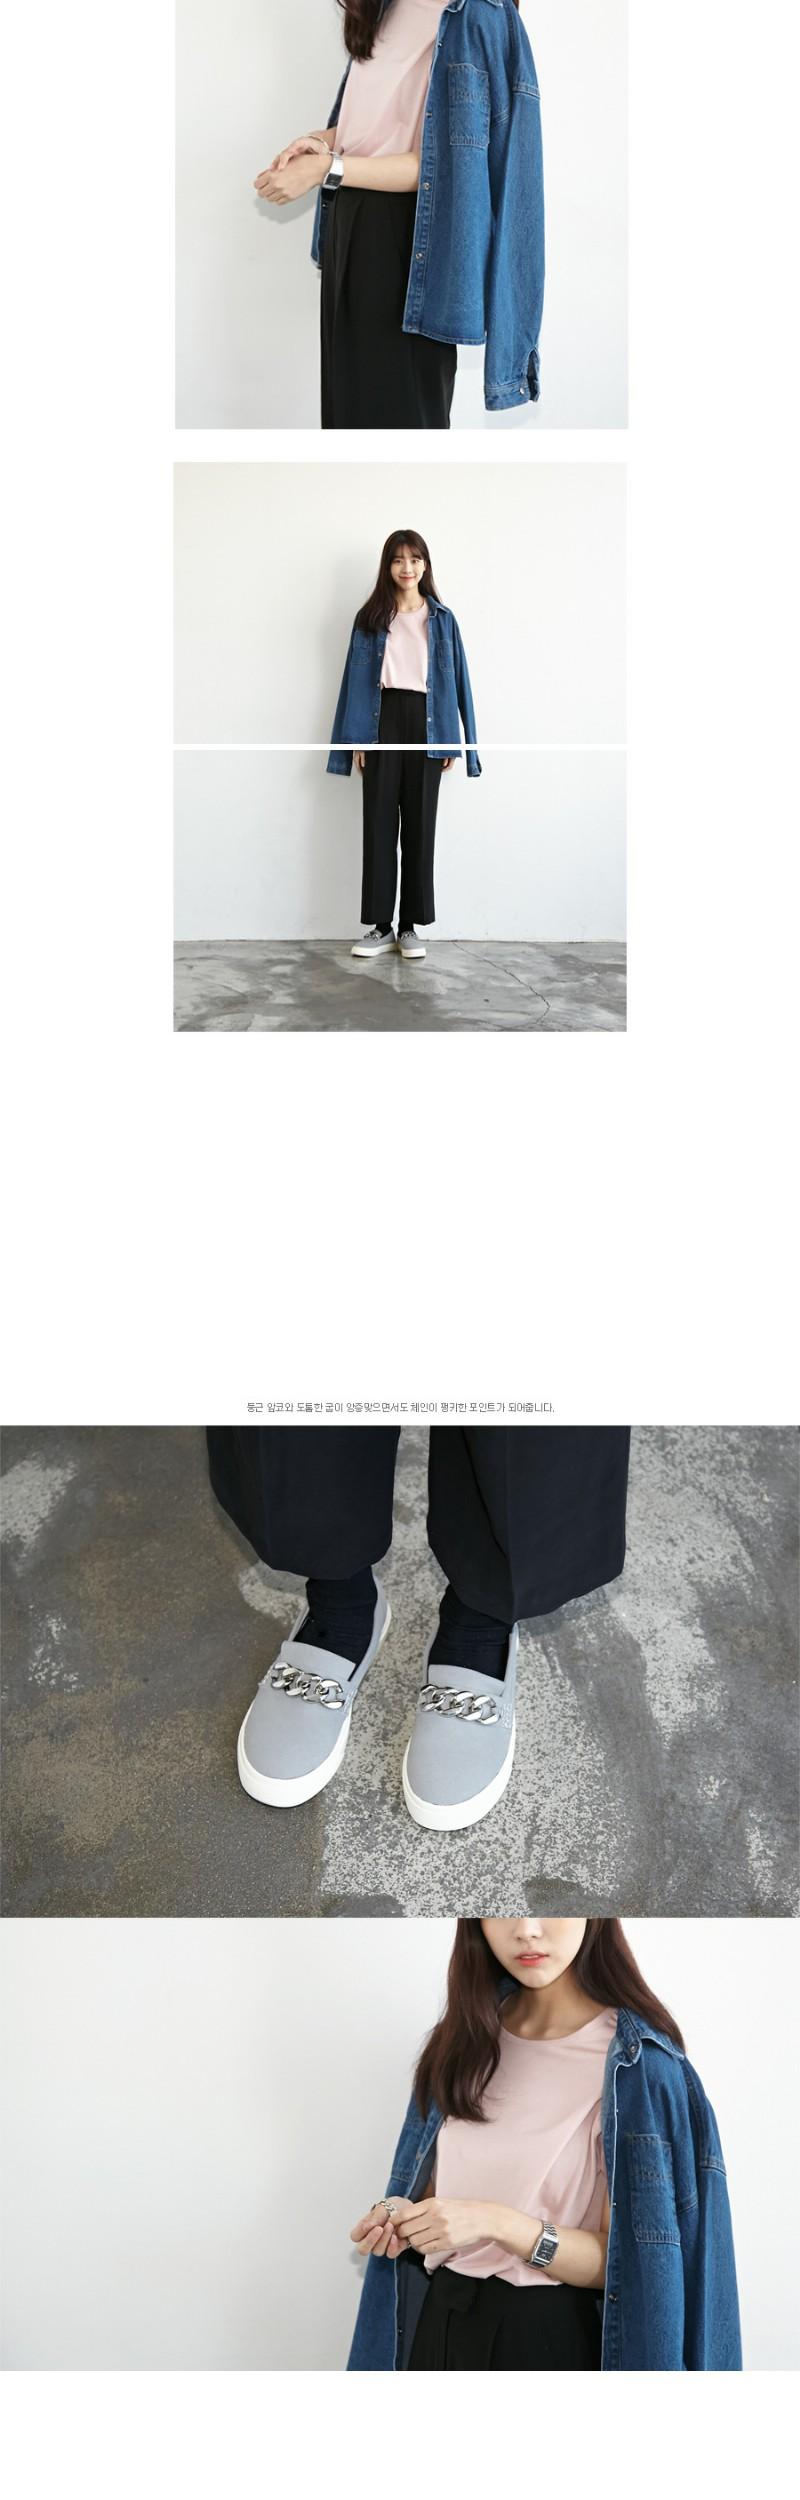 Heavy chain slip-on_SJ